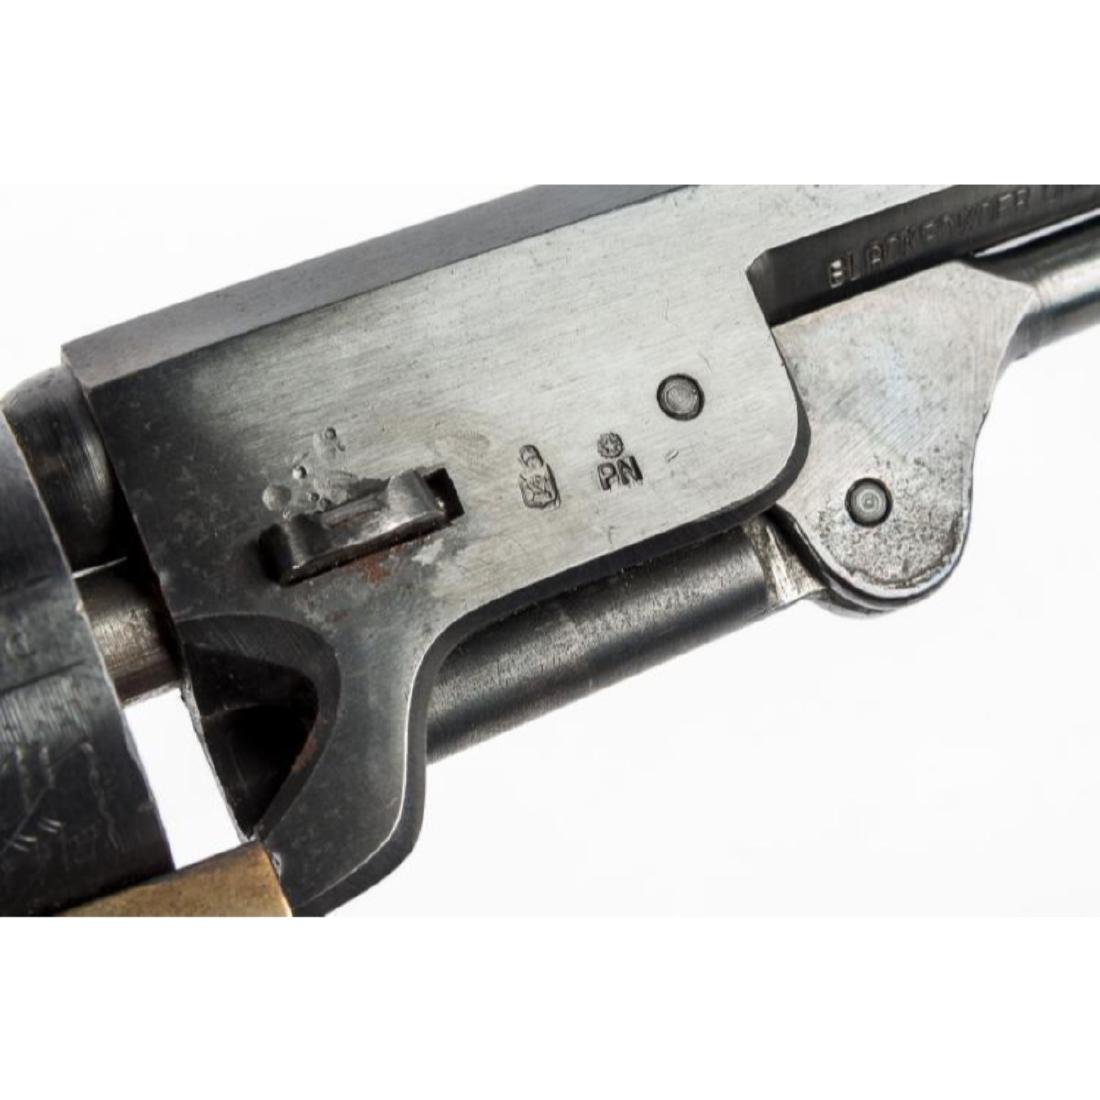 Italian Replica 1851 Navy Revolver - .36 Cal - 2